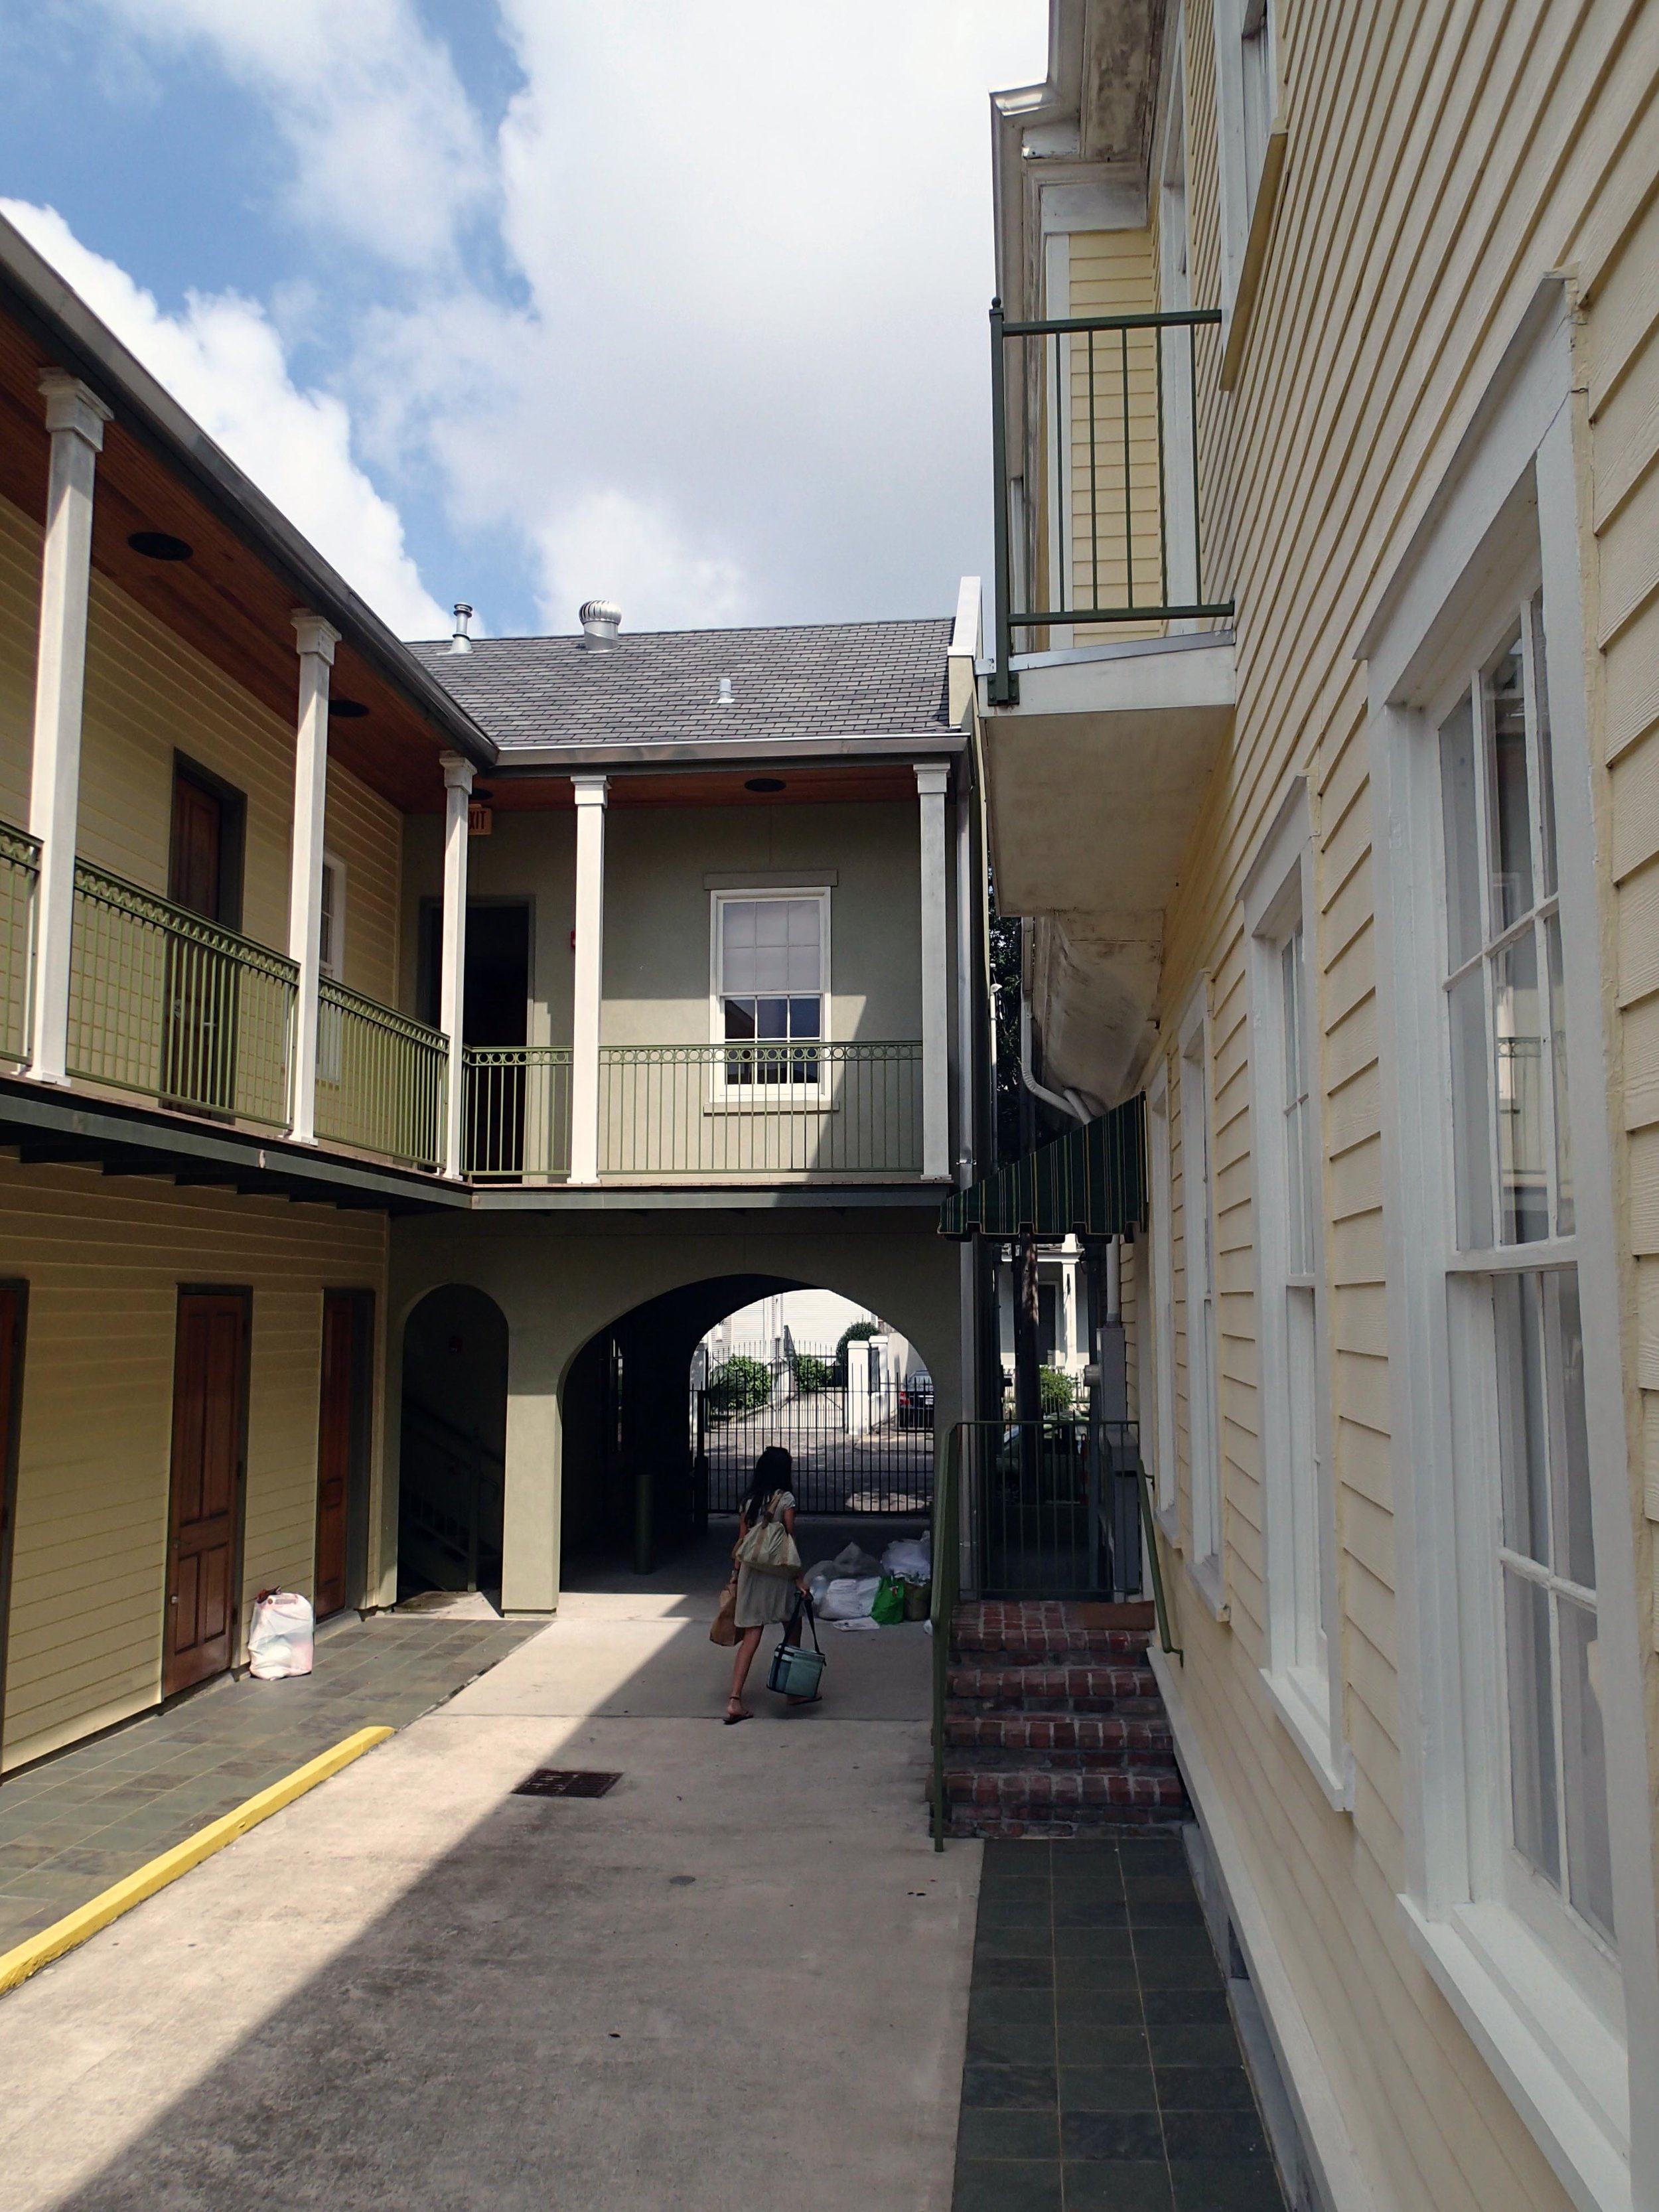 Prytania Oaks Hotel 7-28-13.jpg